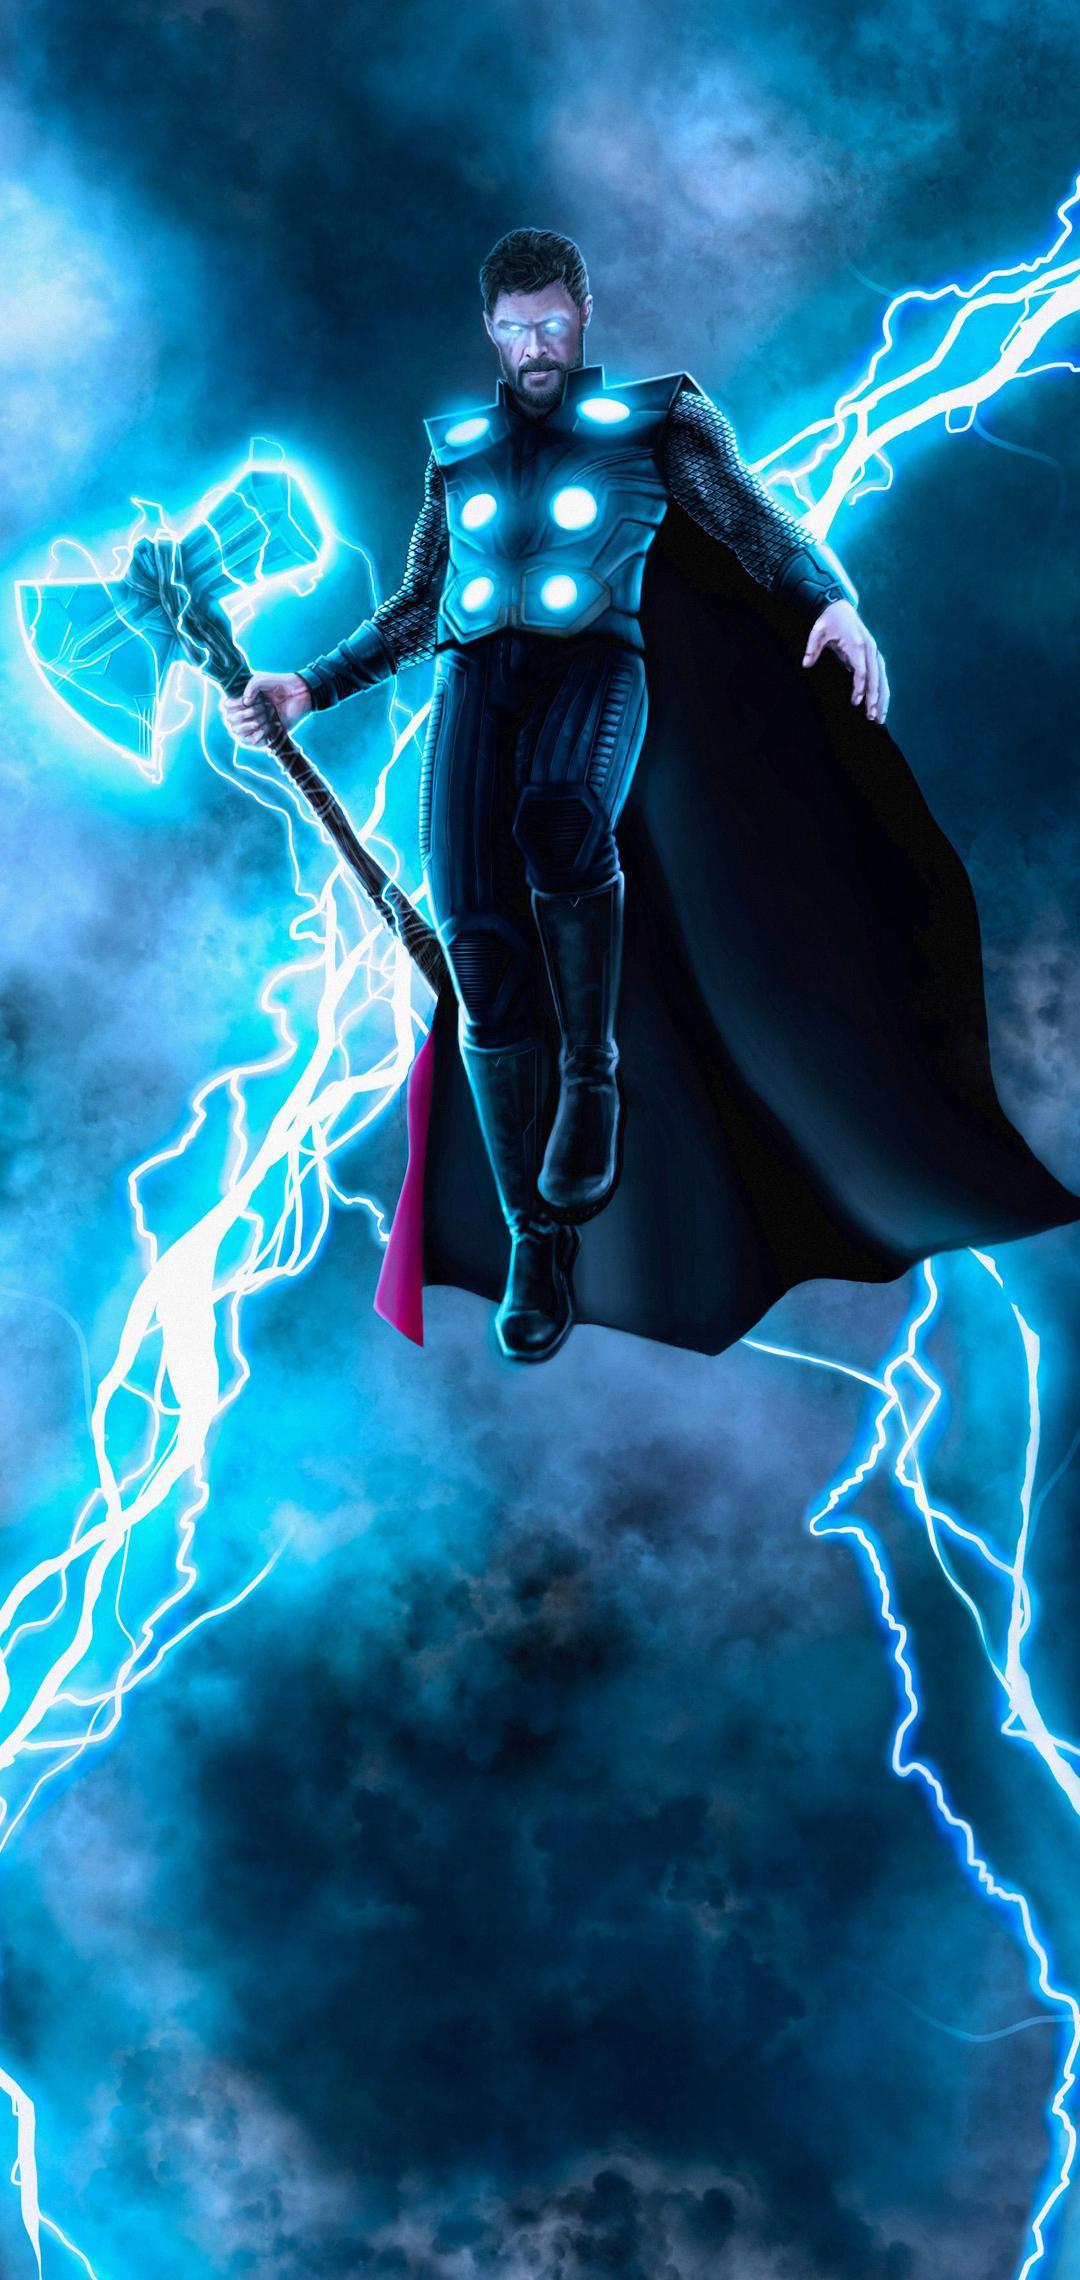 1080x2280 Thor God Of Thunder New Artwork One Plus 6 ...